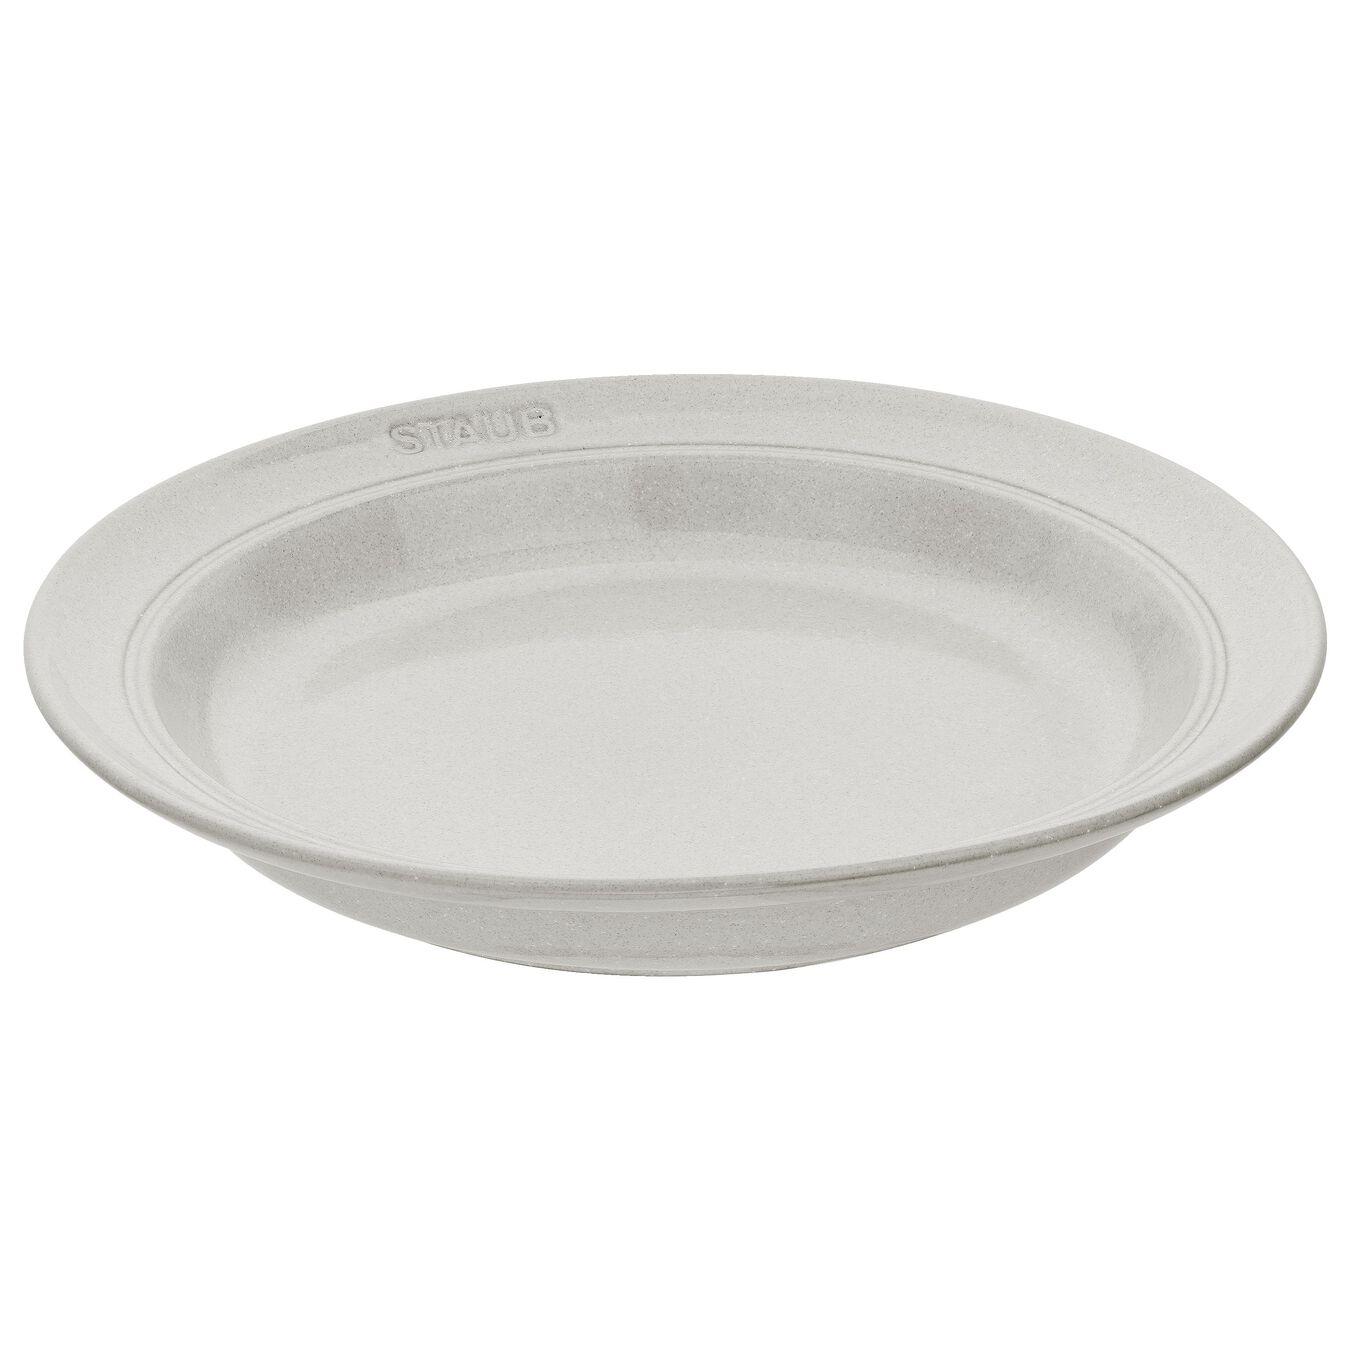 Piatto rotondo - 24 cm, tartufo bianco,,large 1